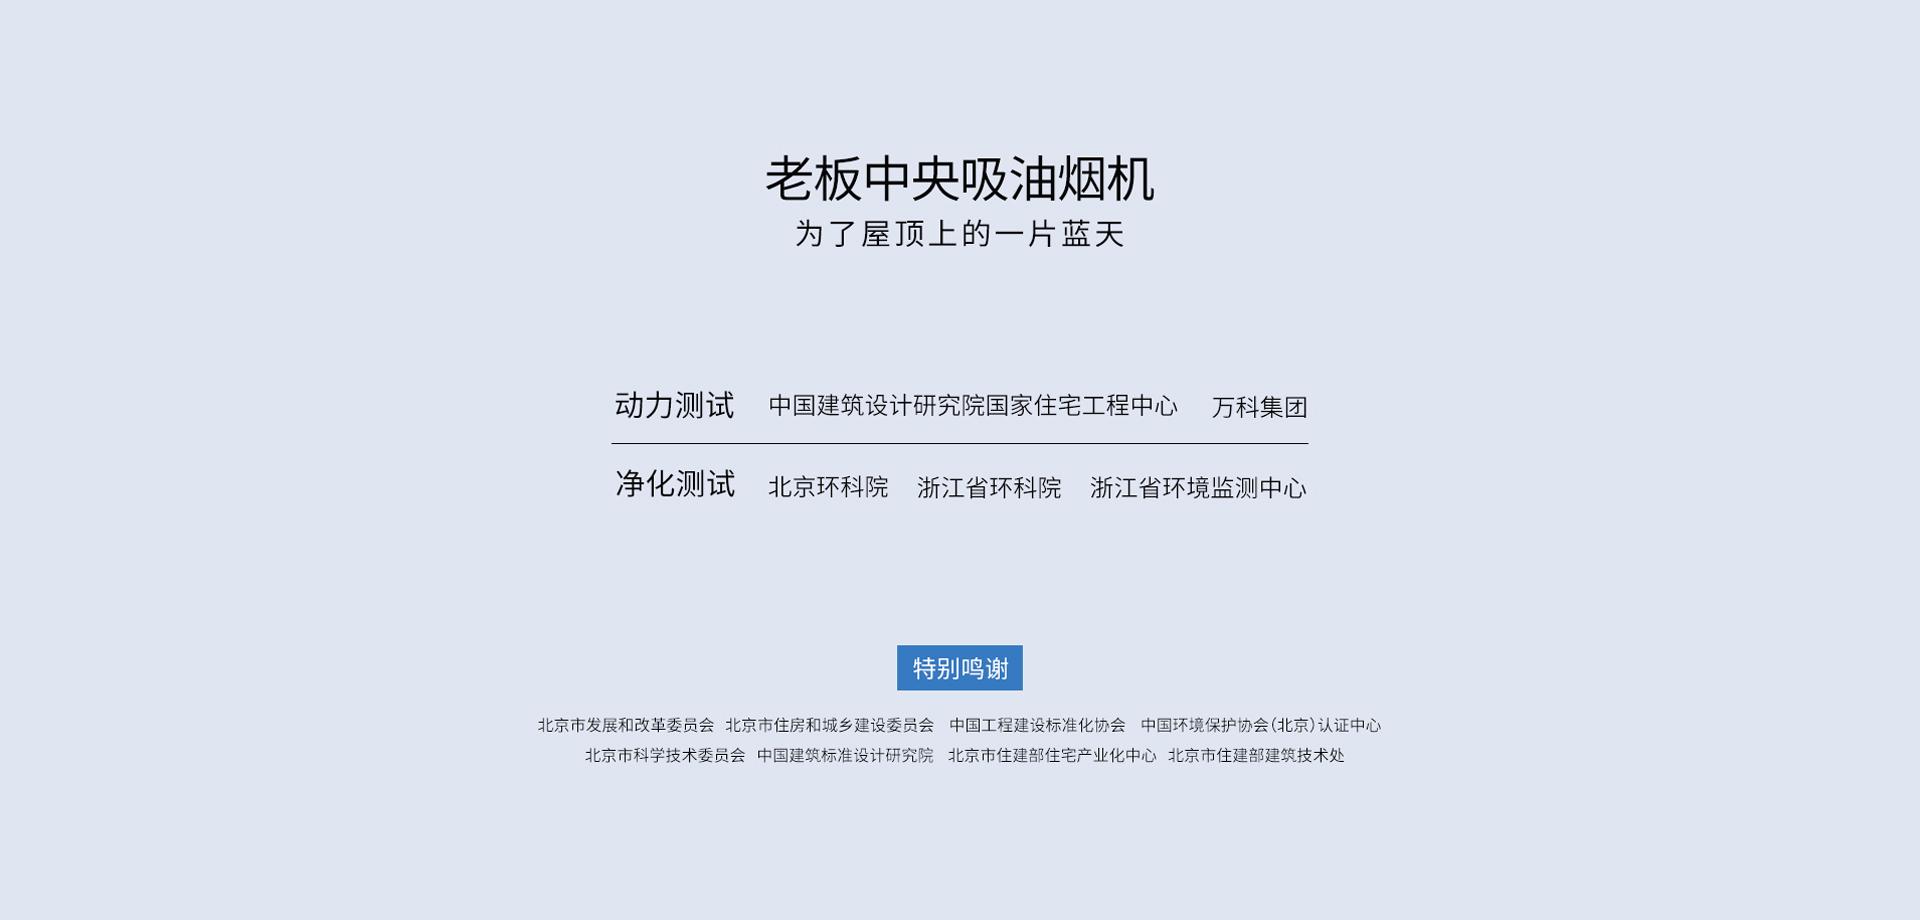 CCS-SLX-45A网页版-0920_09.jpg